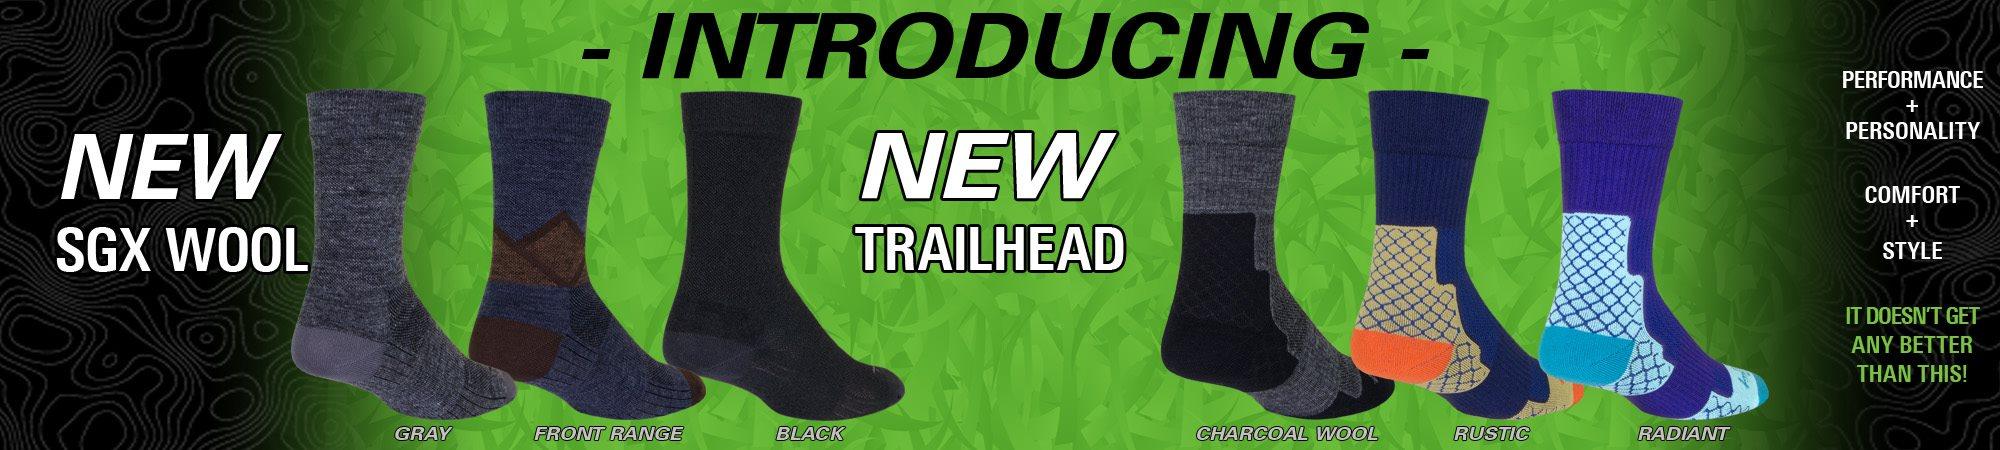 SockGuy_NewSGXWool_NewTrailhead